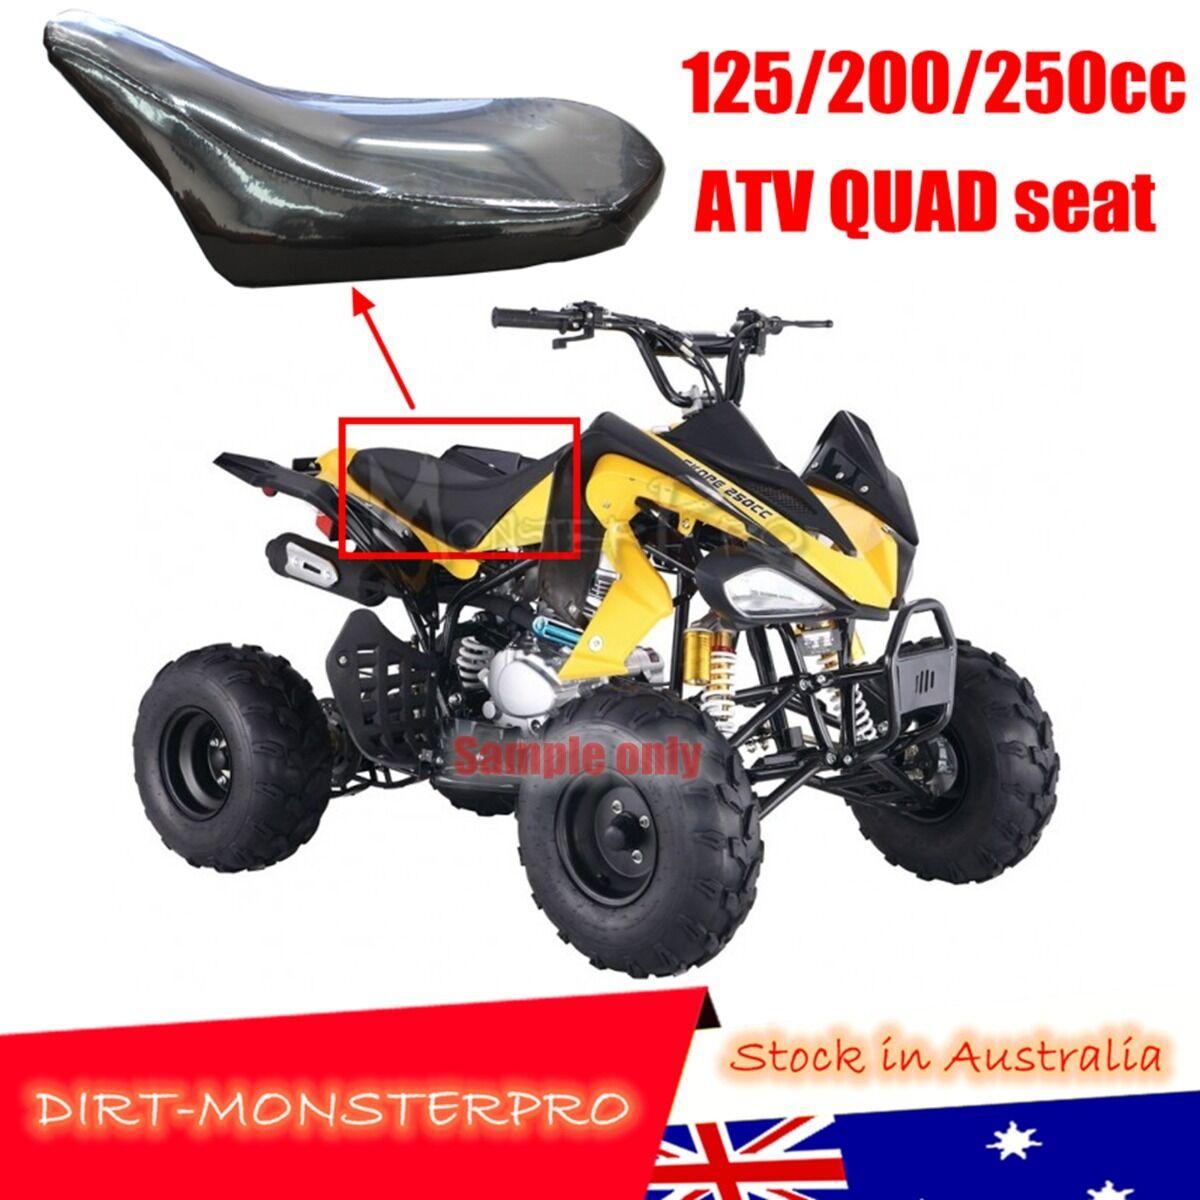 QUAD SEAT 150cc 200cc 250cc ATV Zongshen Loncin Buggy Motorcycle lei